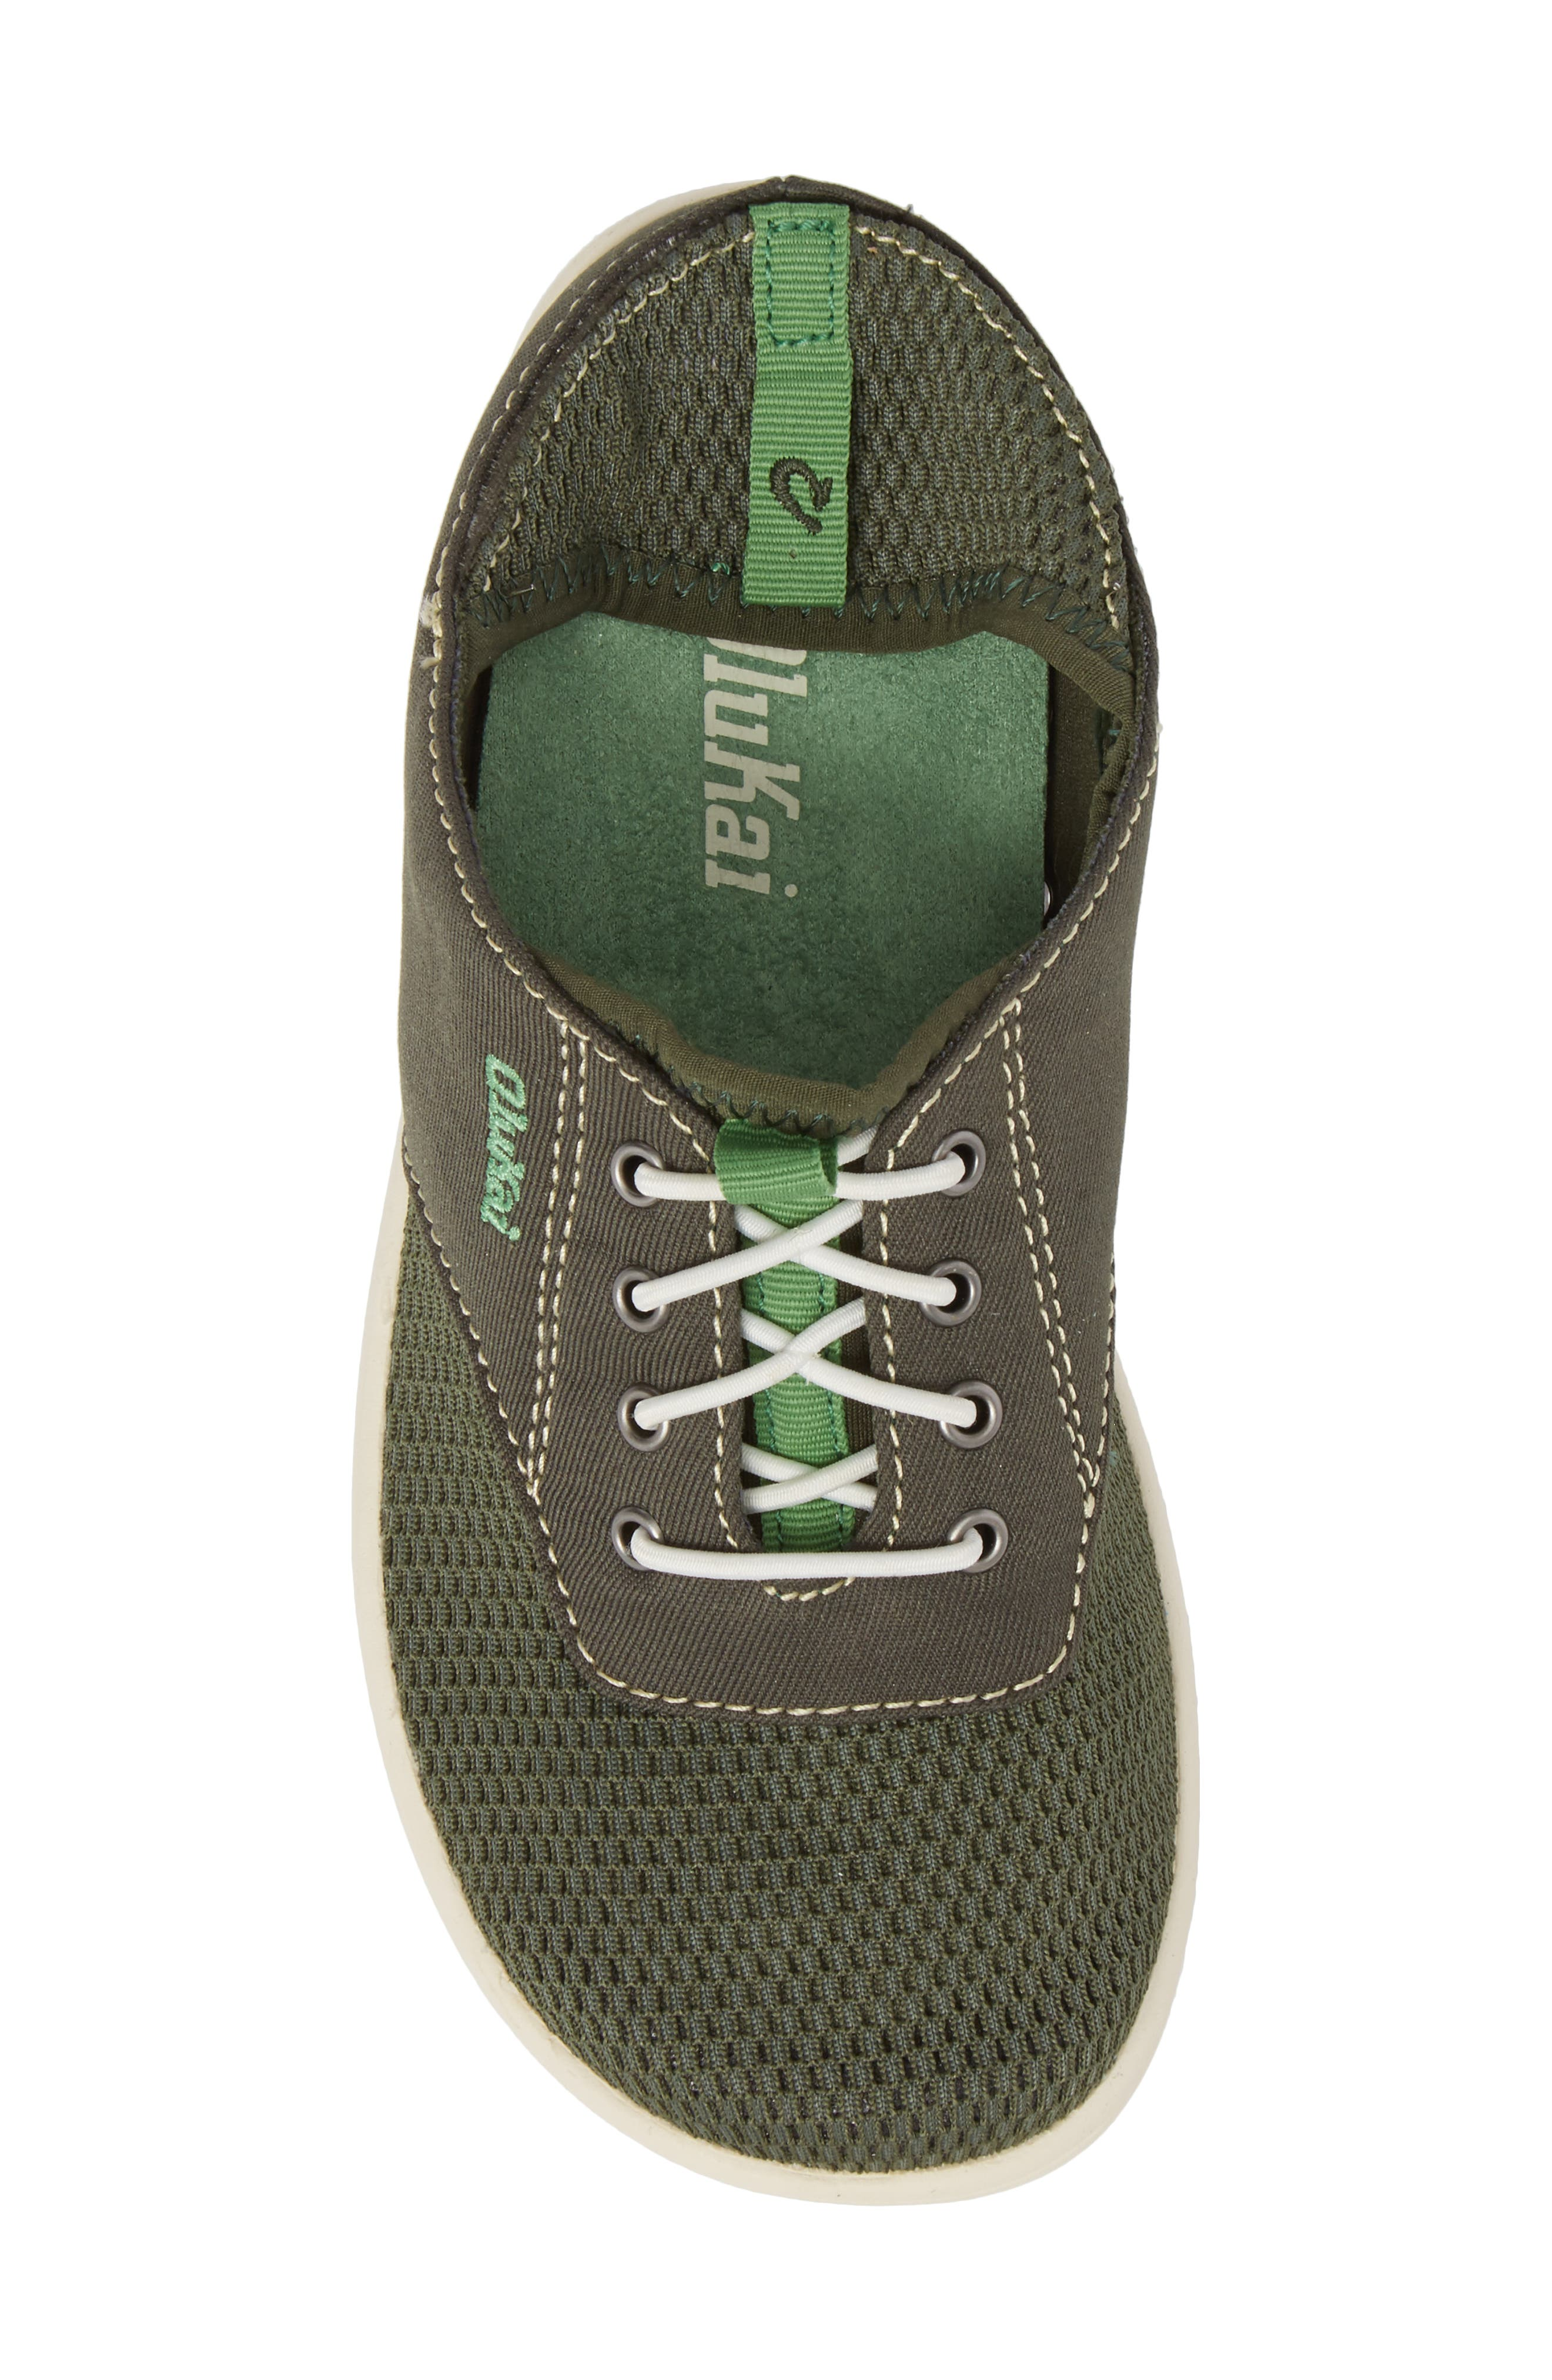 OLUKAI, Nohea Moku Water Resistant Shoe, Alternate thumbnail 6, color, SEA GRASS/ SEA GRASS